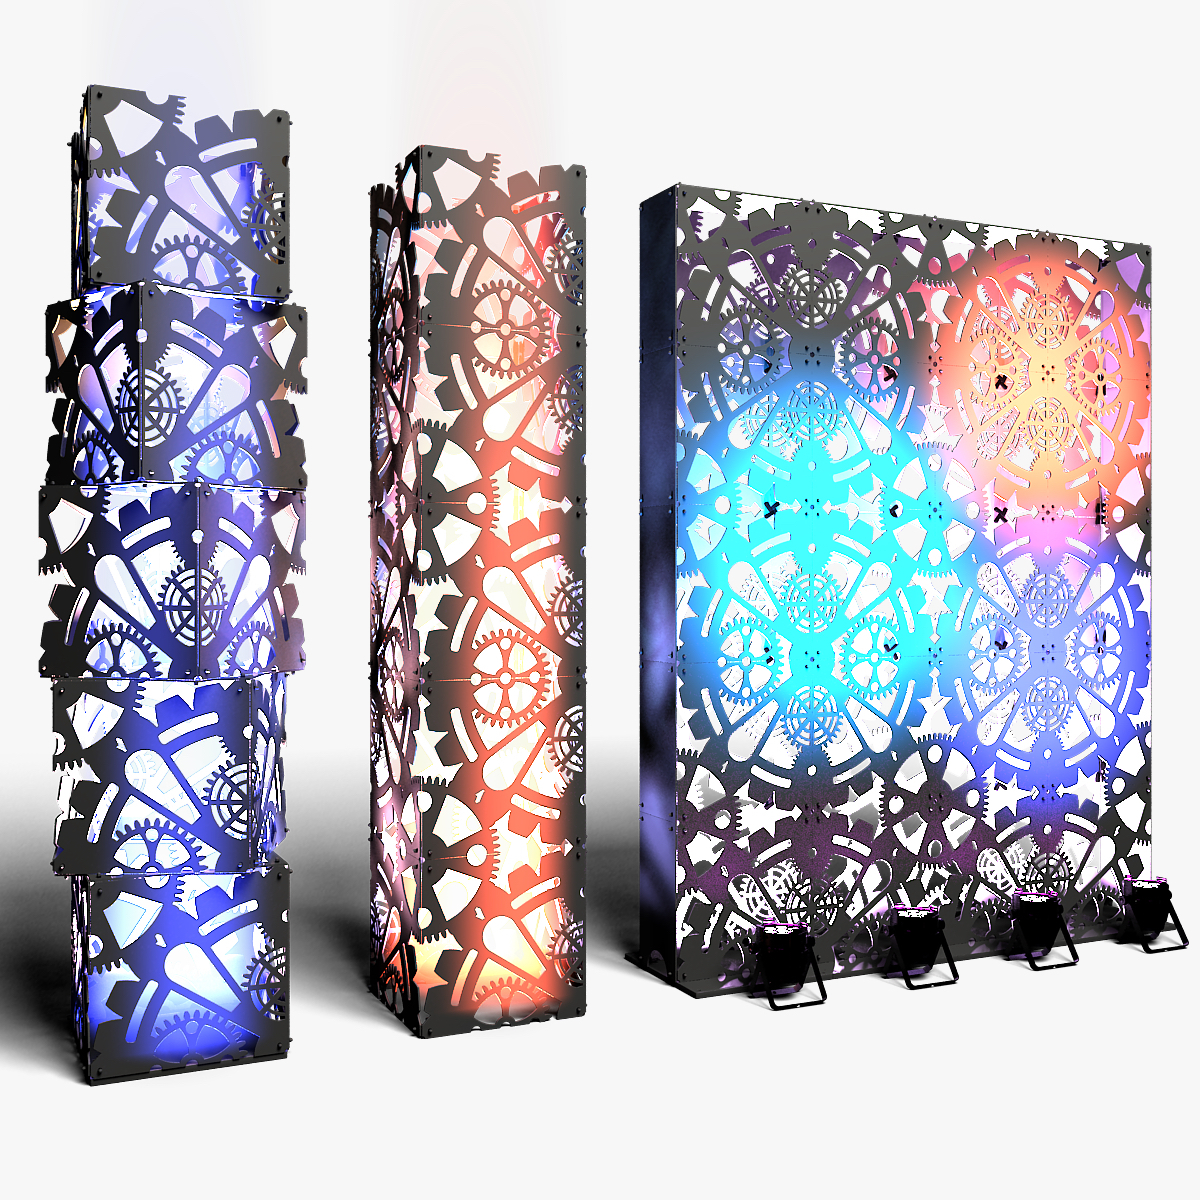 70-01-01-1200x1200.jpg Download STL file Stage Decor Collection 01 (Modular 9 Pieces) • 3D printer model, akerStudio